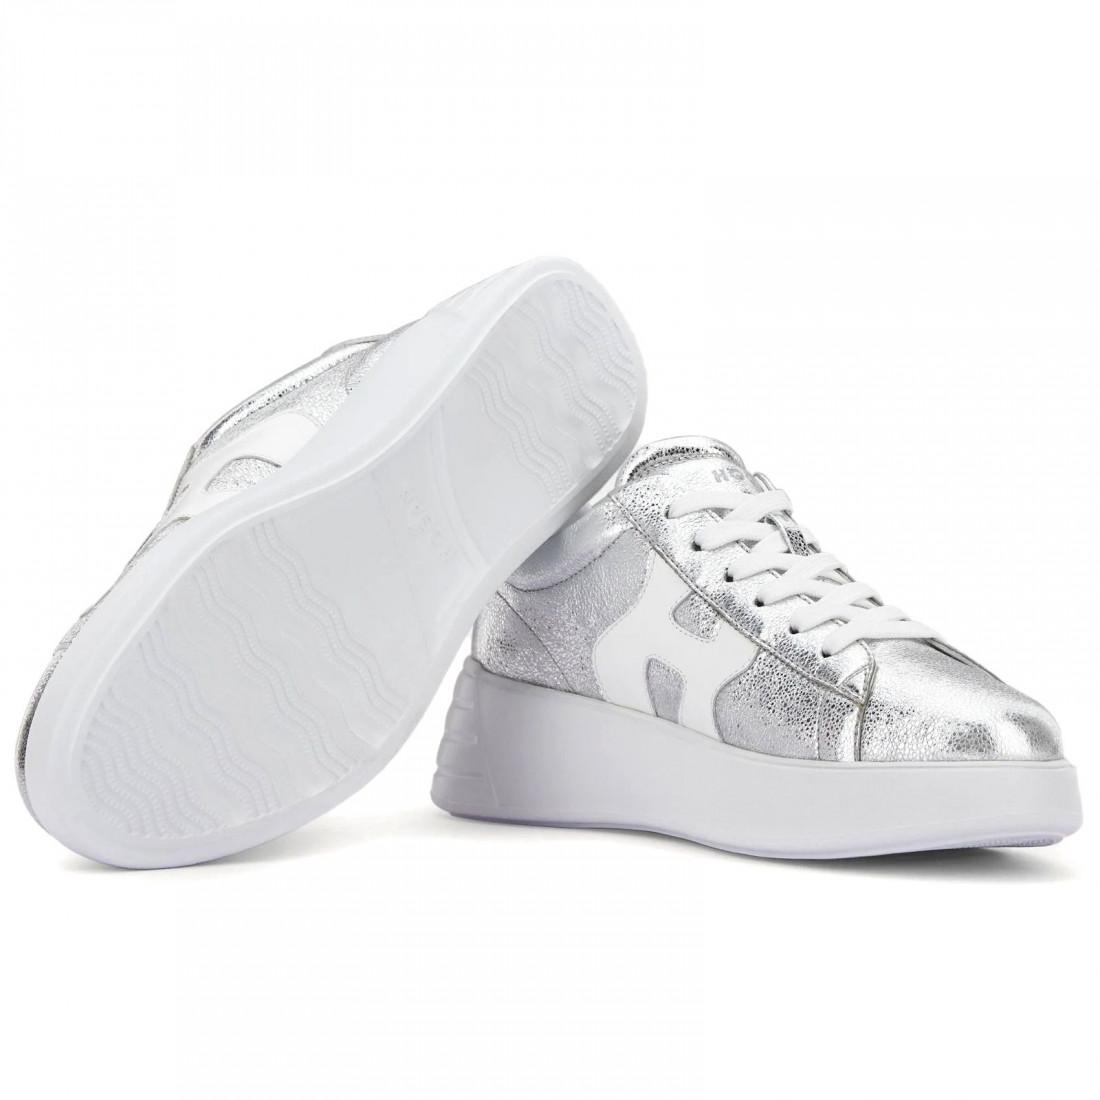 sneakers damen hogan hxw5620dn61q8t0906 8868